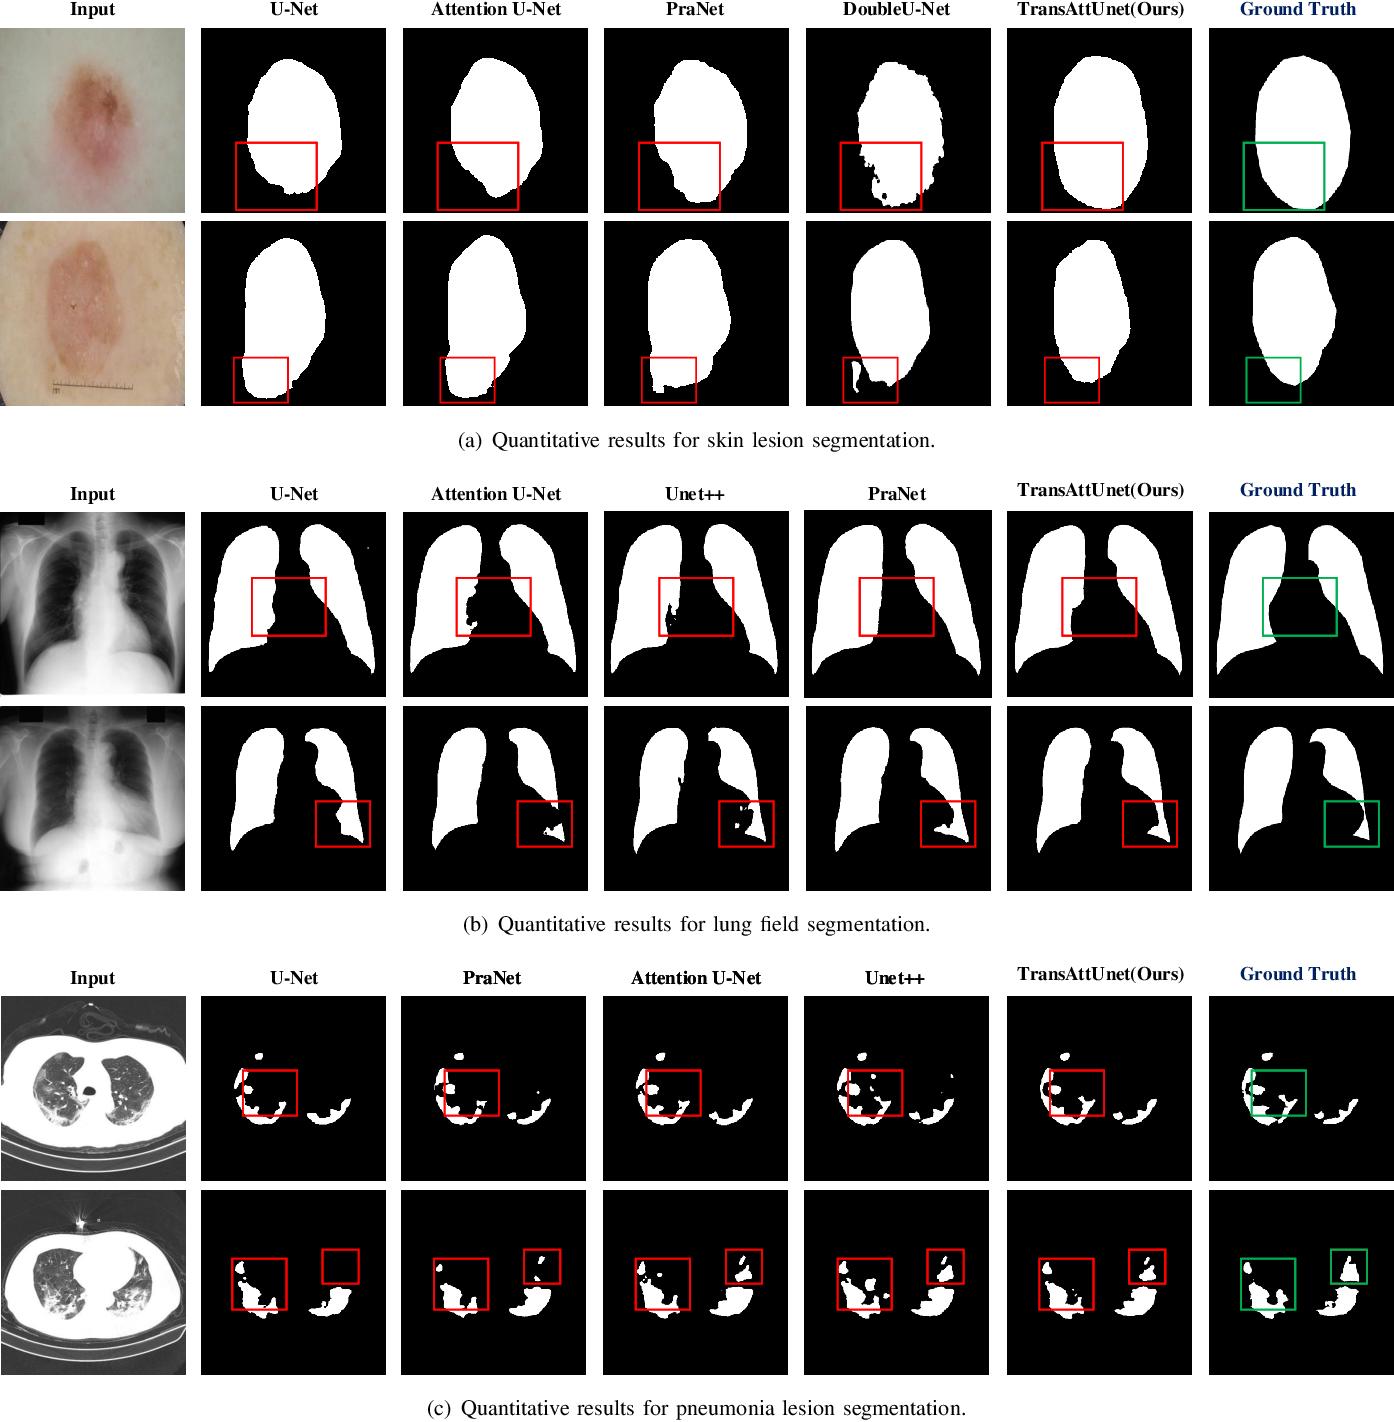 Figure 4 for TransAttUnet: Multi-level Attention-guided U-Net with Transformer for Medical Image Segmentation